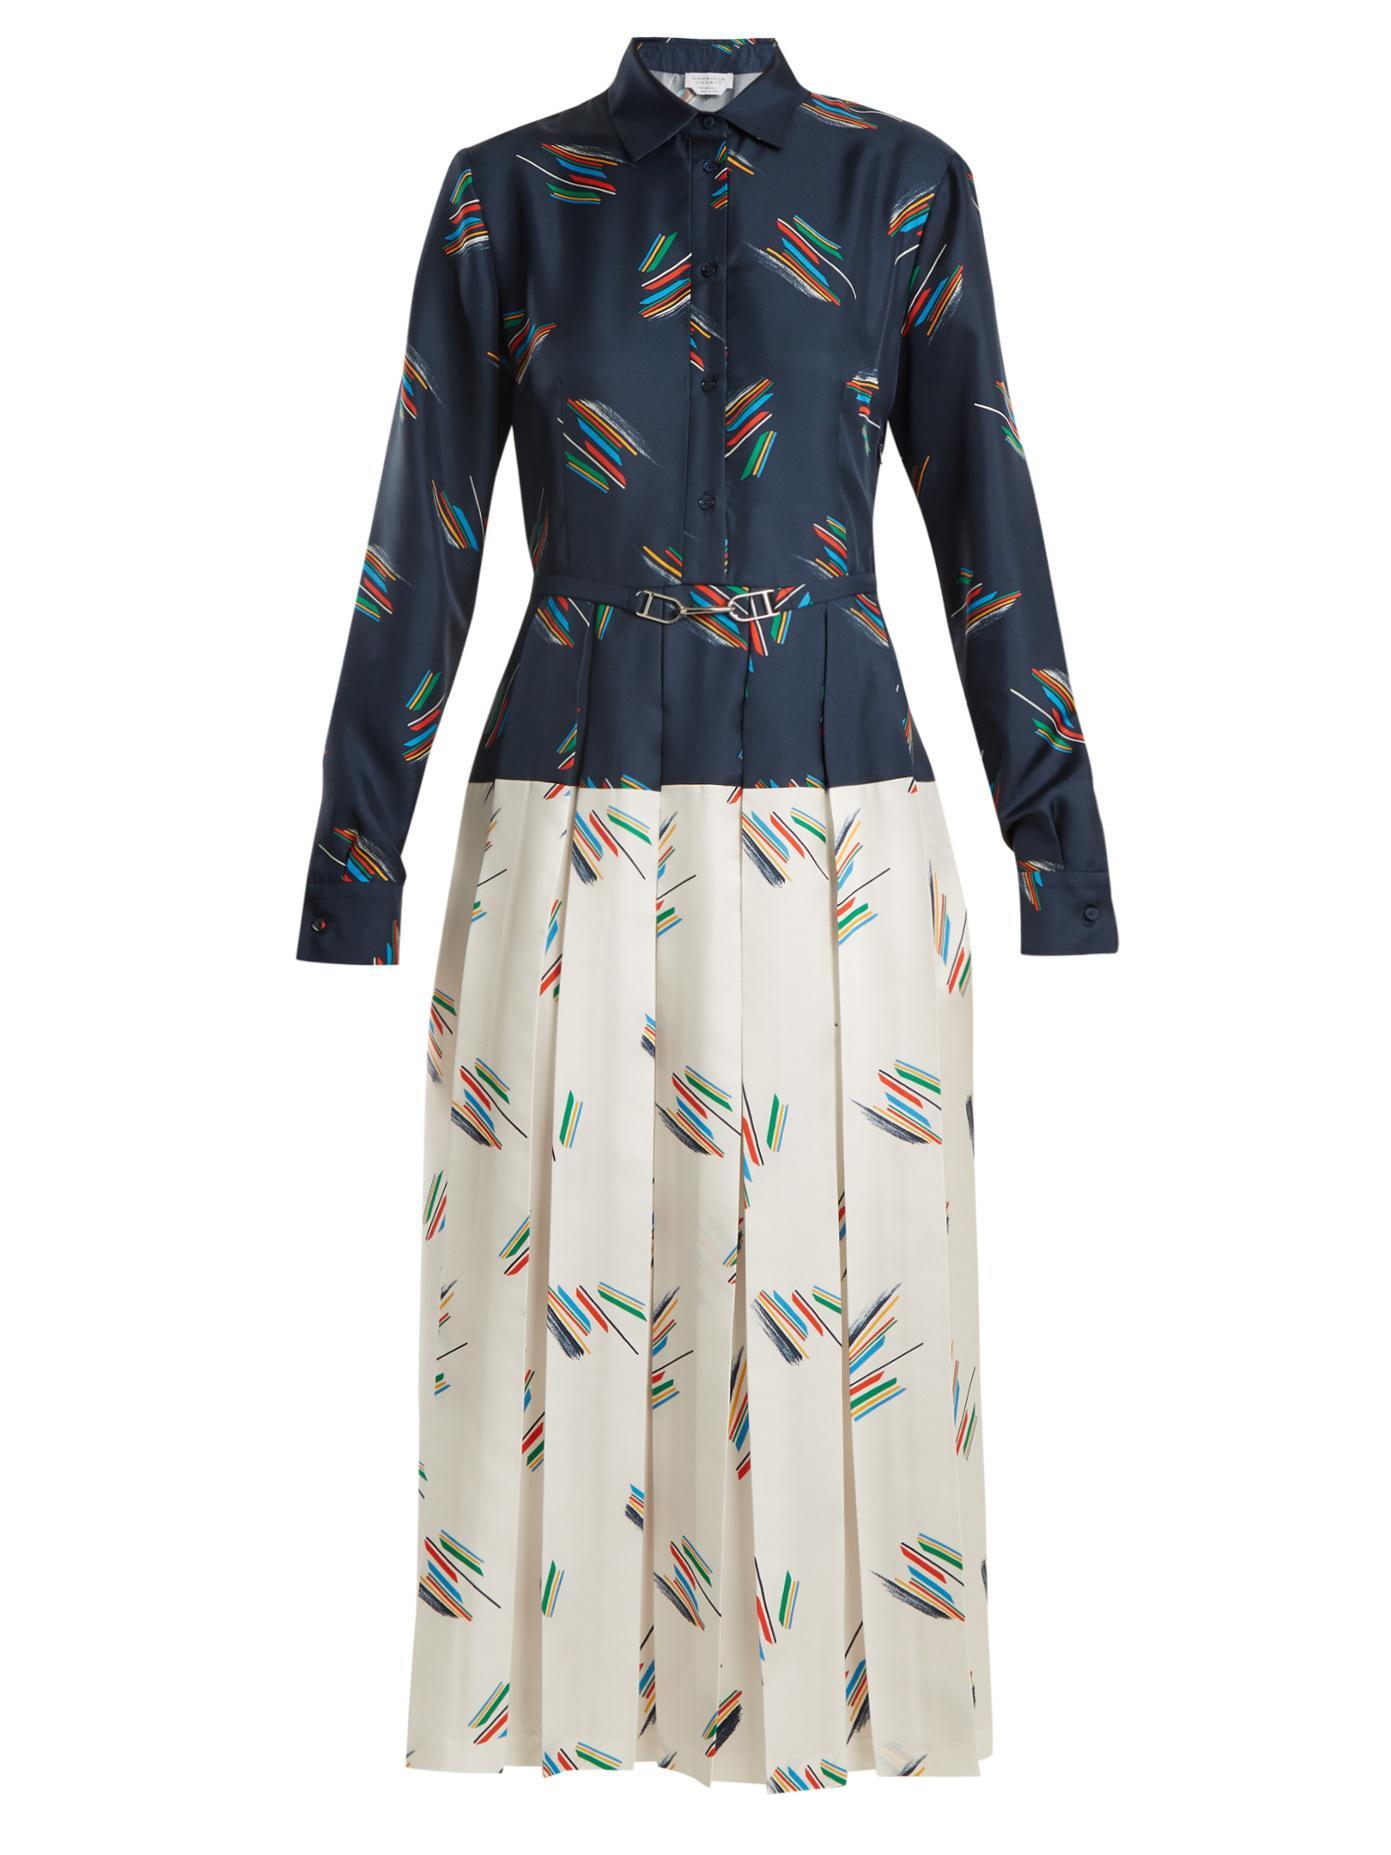 Rosa spread-collar abstract-print silk dress Gabriela Hearst xXu5hvSJRG